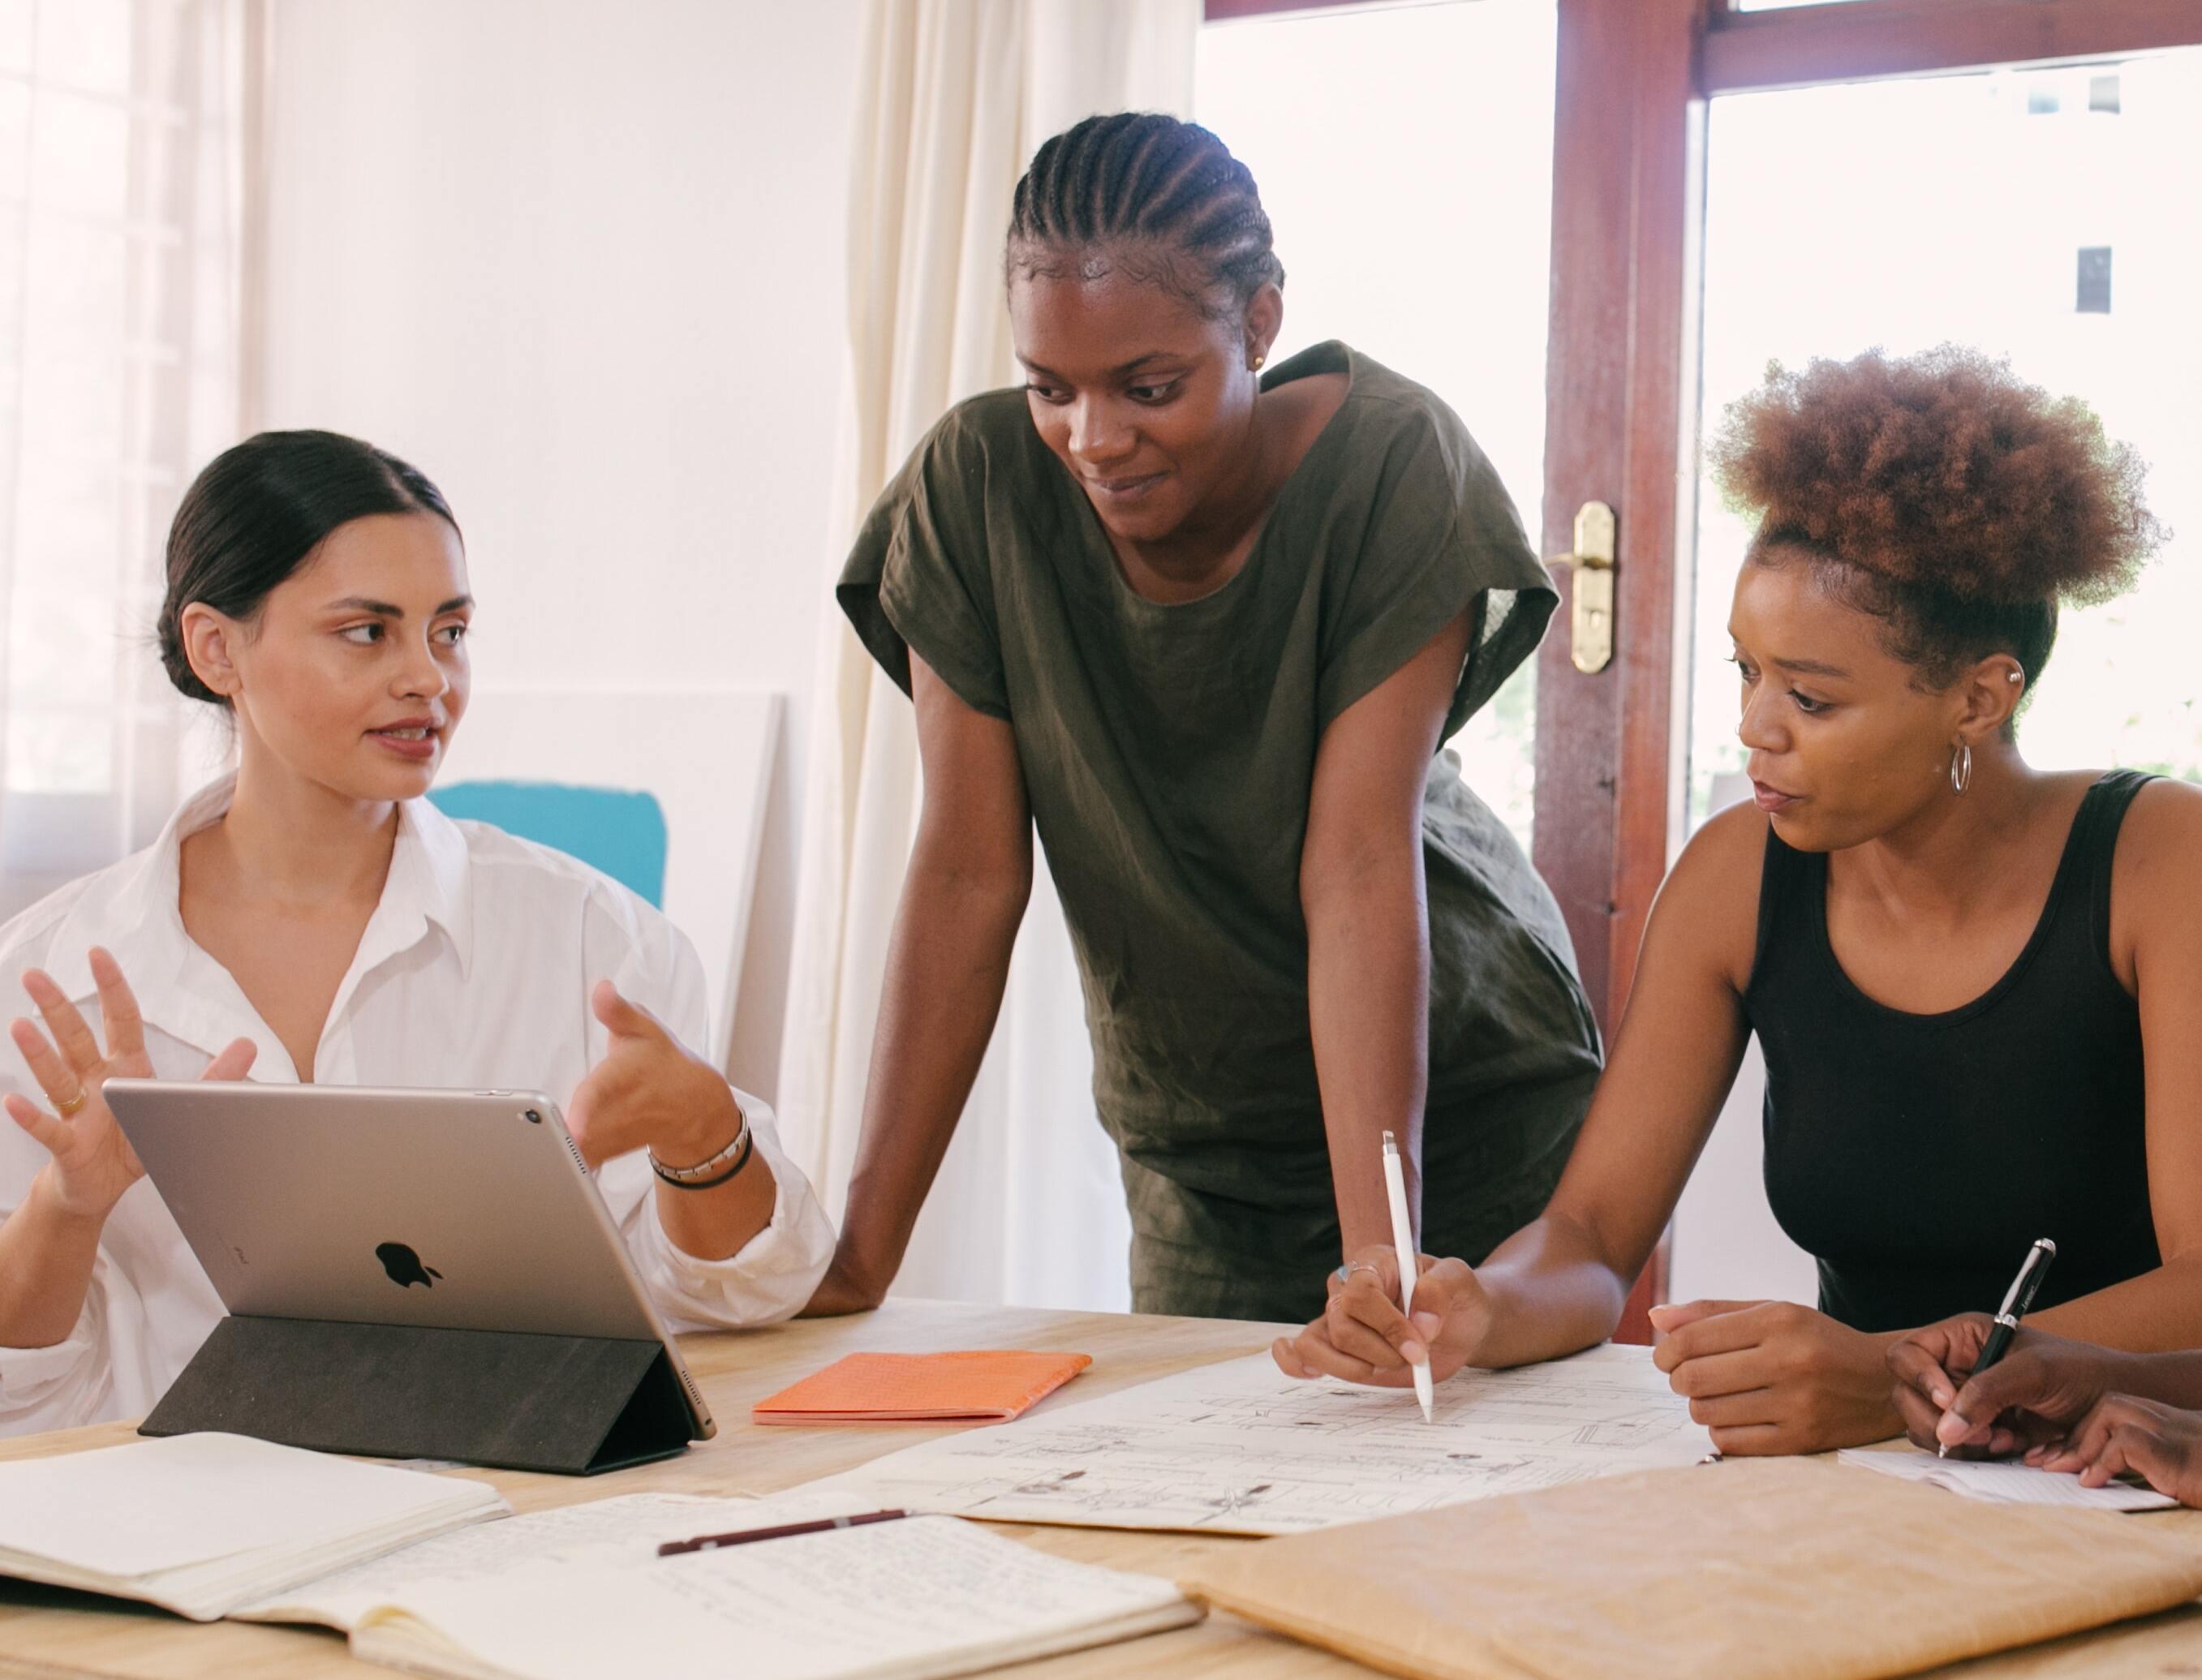 women at meeting discussing content marketing pitfalls